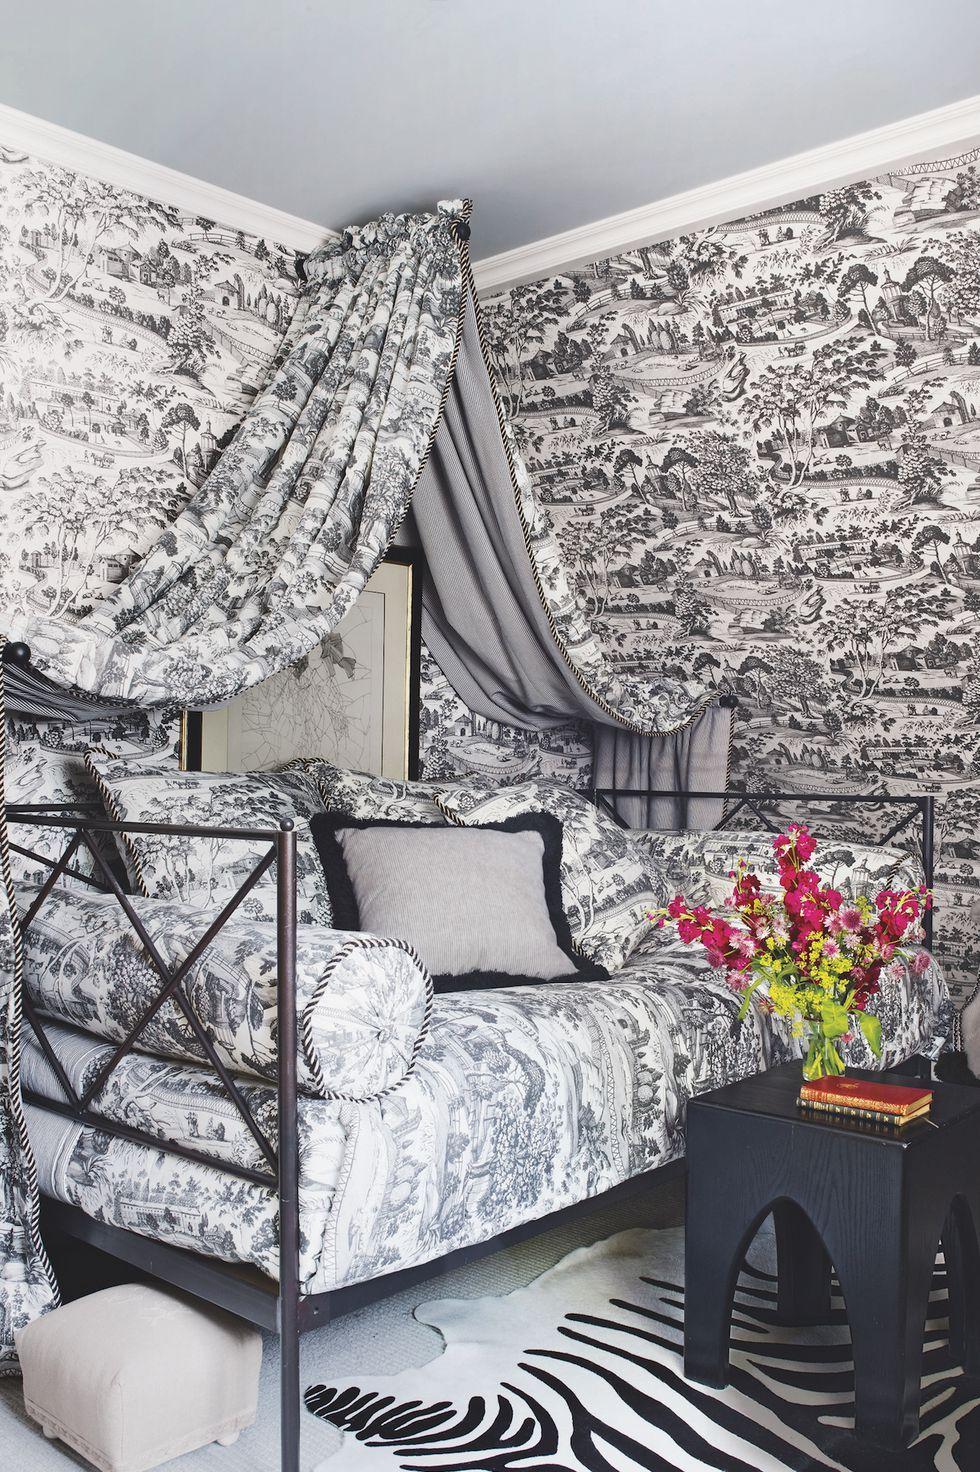 14 Cozy Living Room Bedroom Ideas How To Design A Warm Room